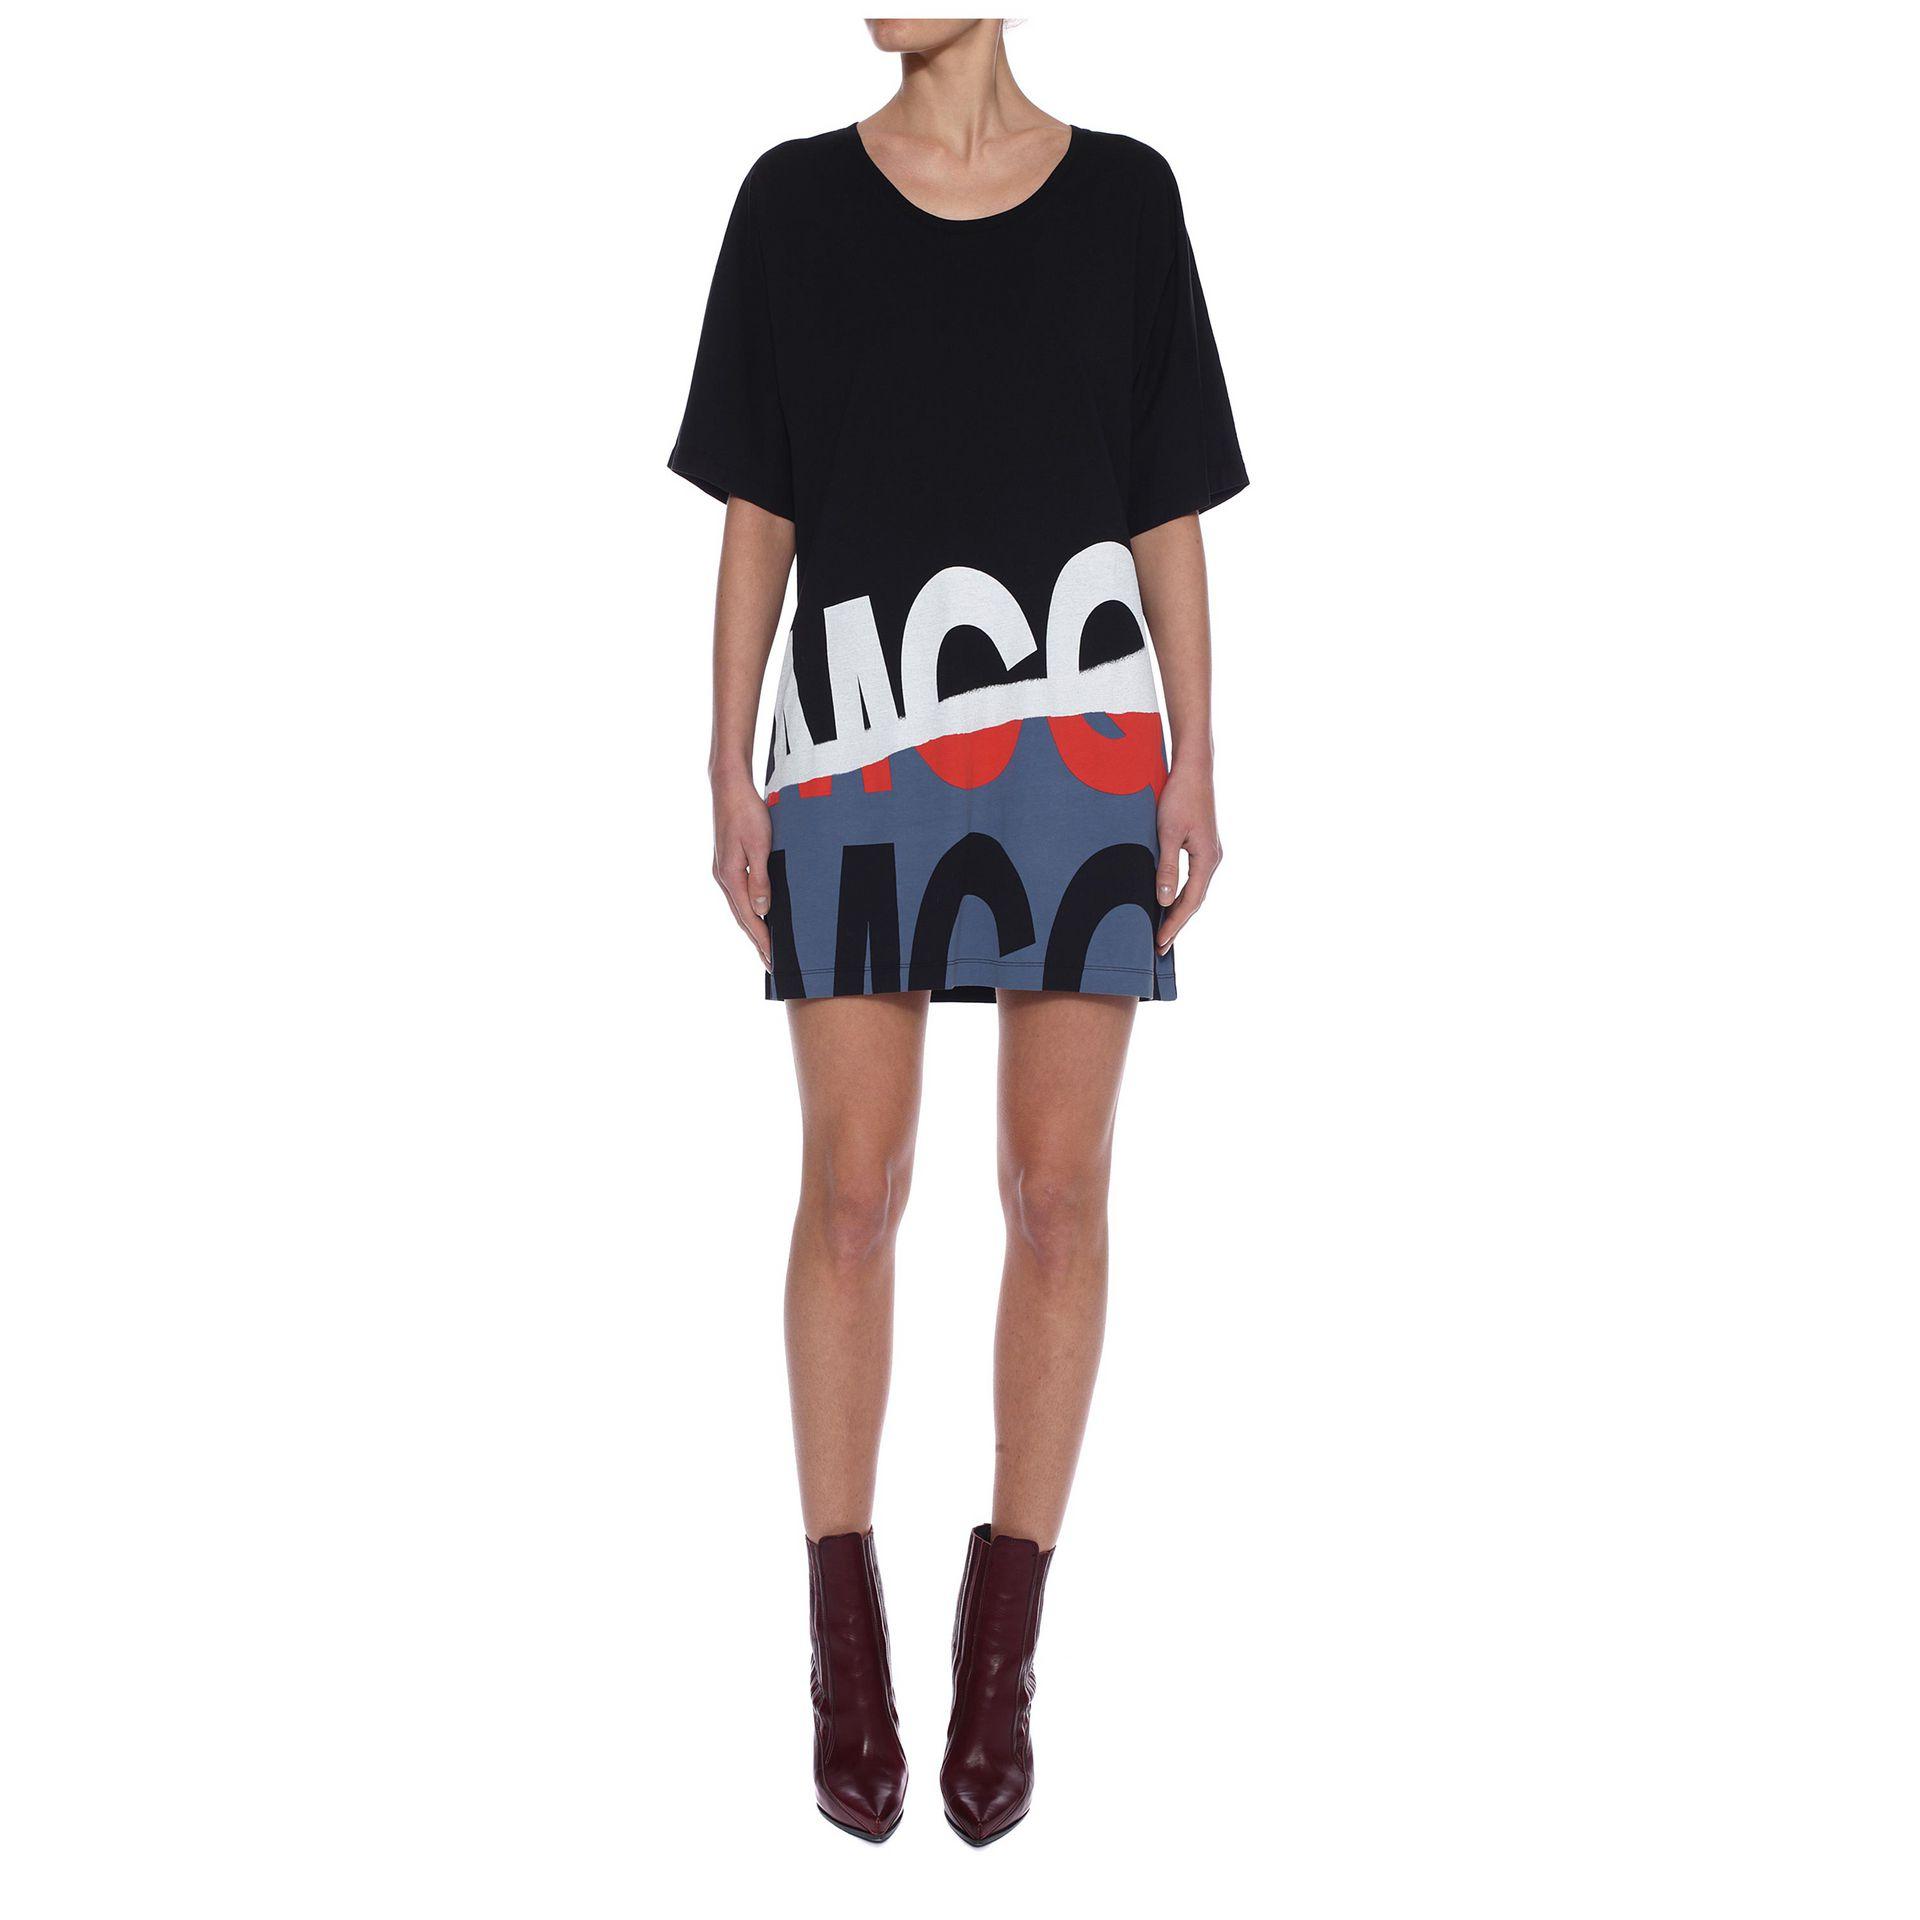 Lyst mcq mcq folded logo t shirt dress in black for Logo t shirt dress